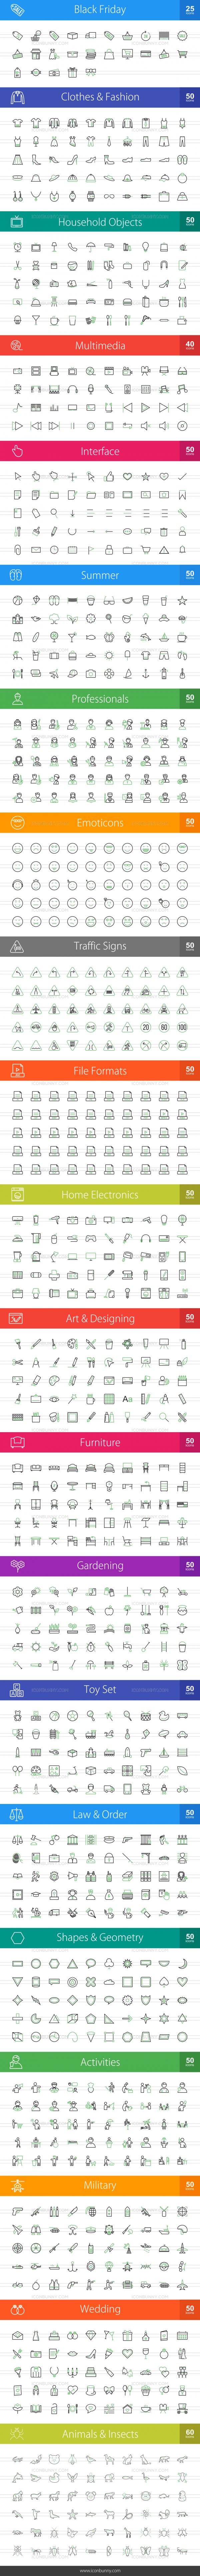 1025 Line Green & Black Icons Bundle - Preview - IconBunny